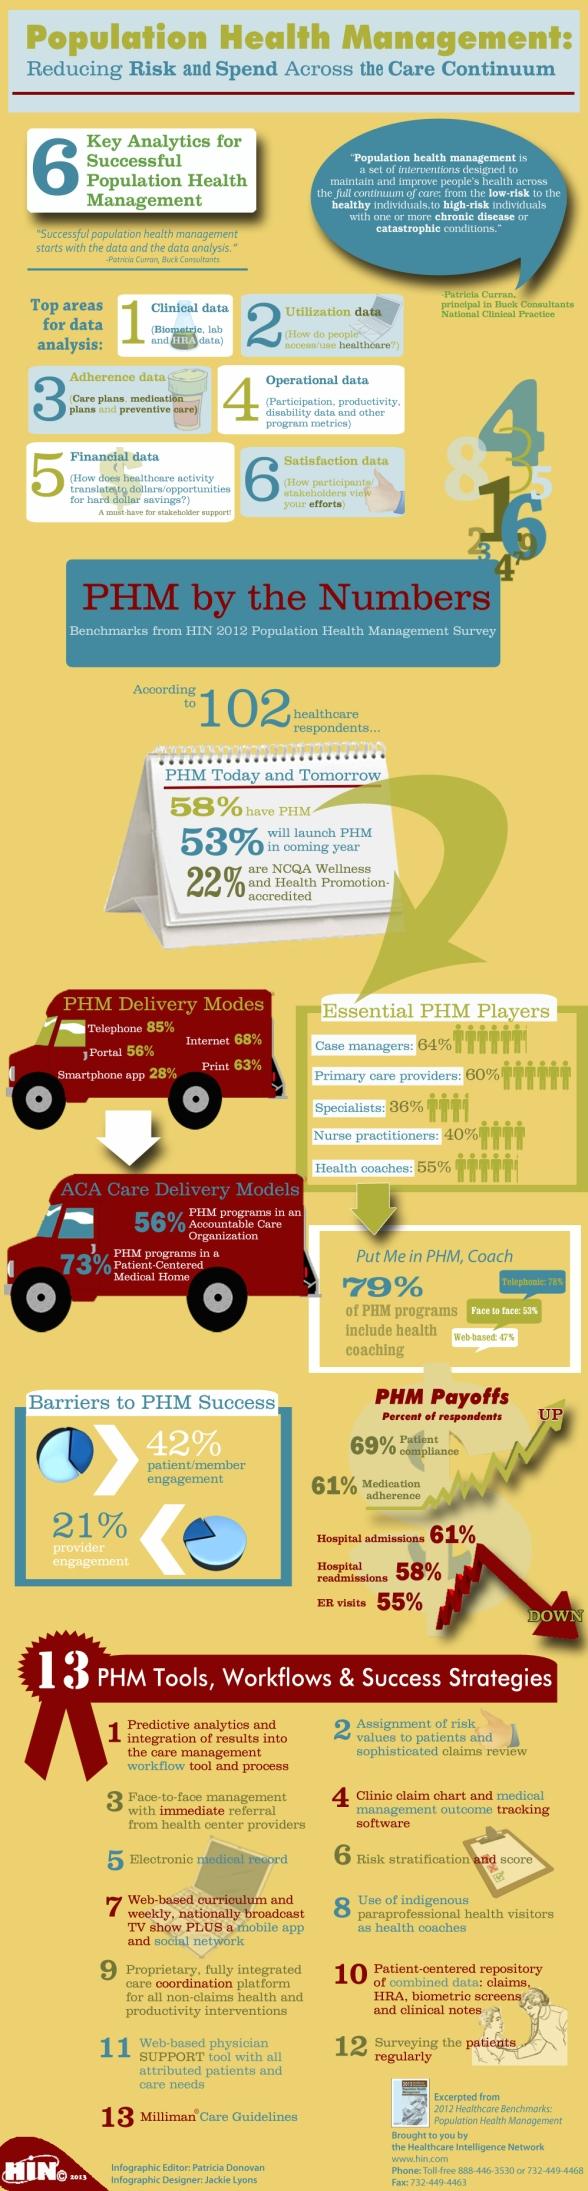 PHM_Infographic